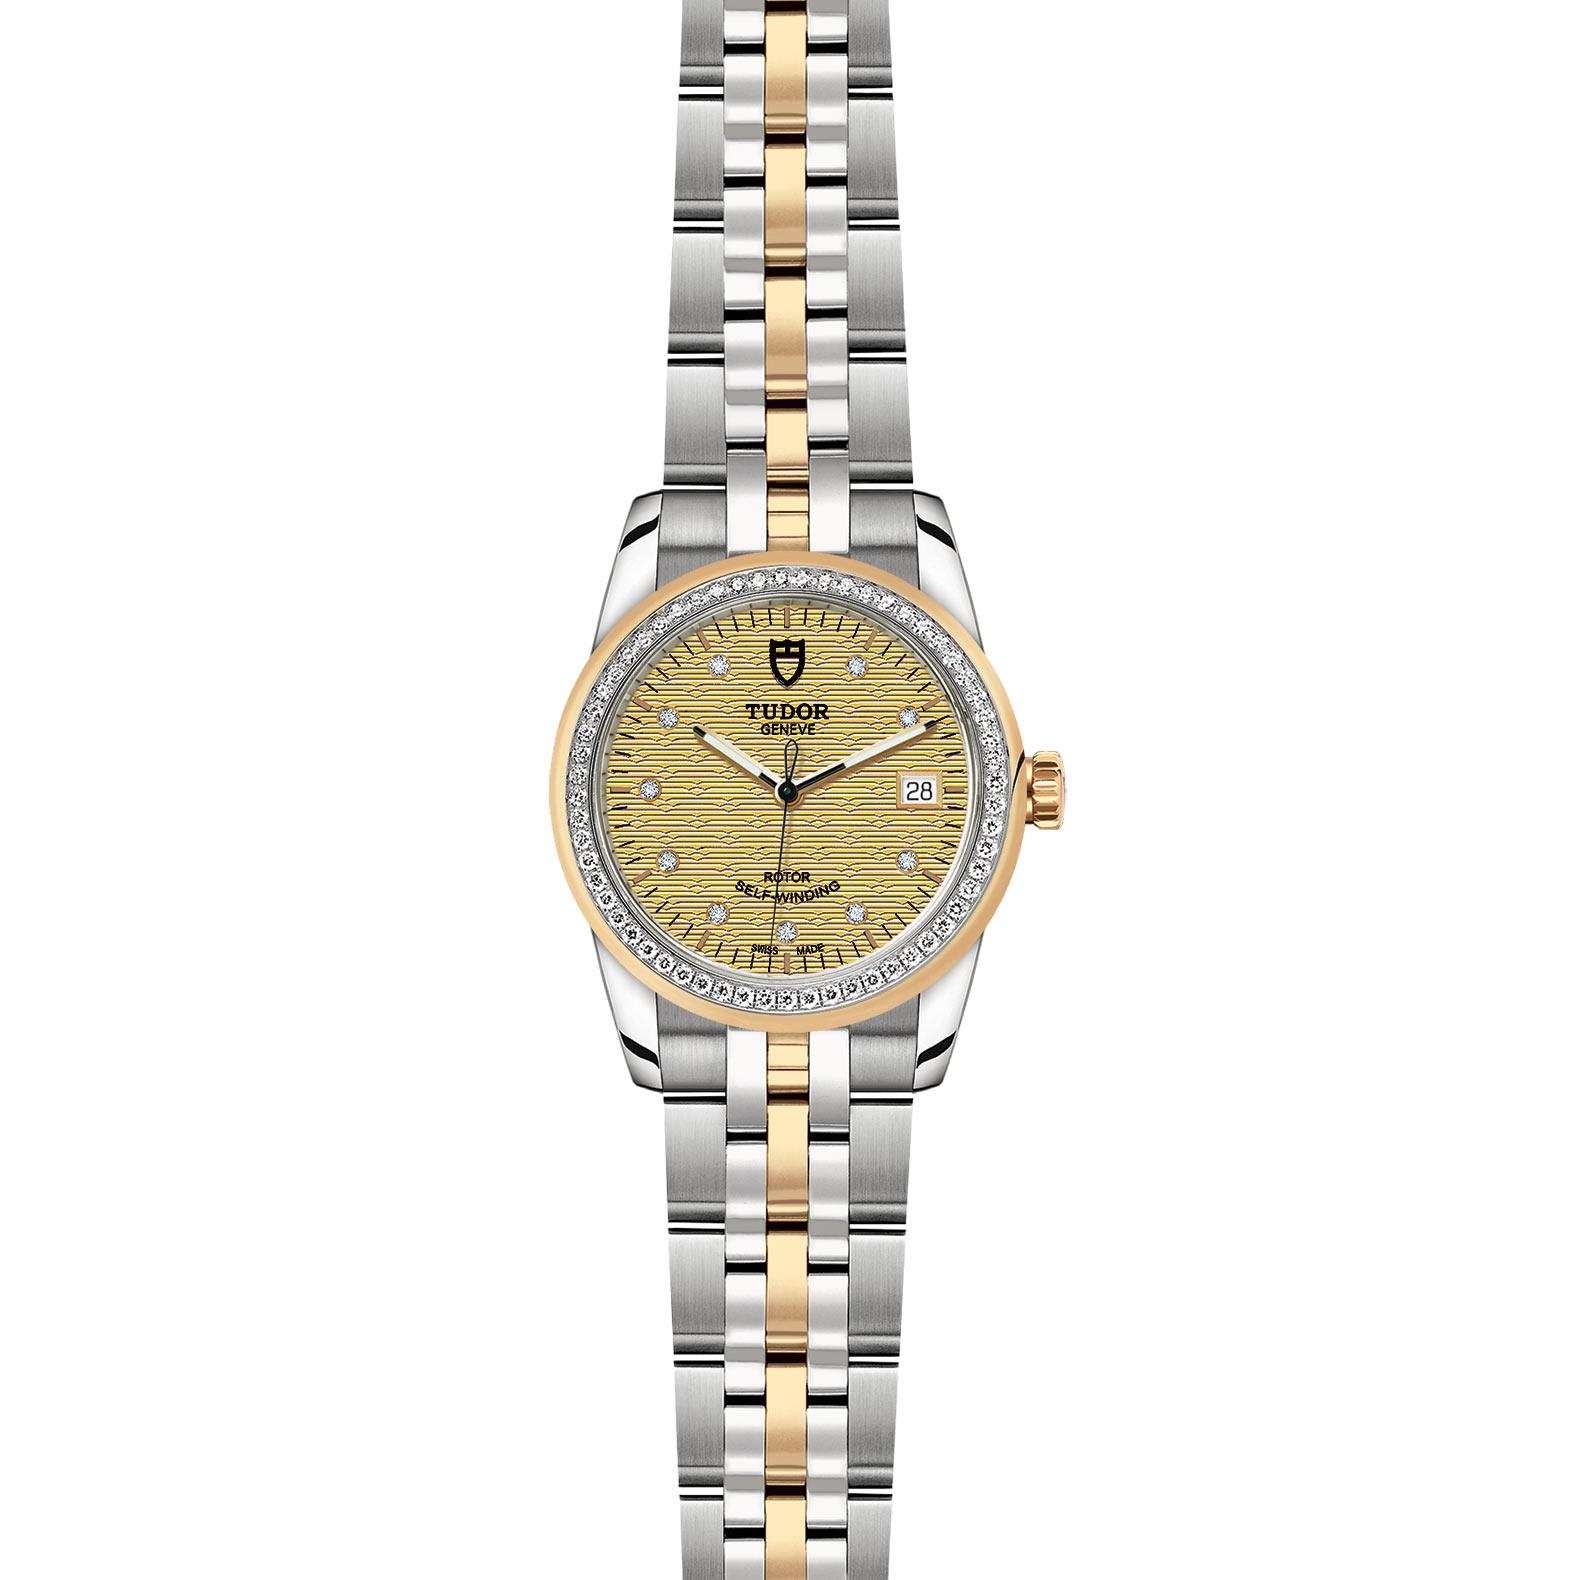 TUDOR Glamour Date M55023 0028 Frontfacing